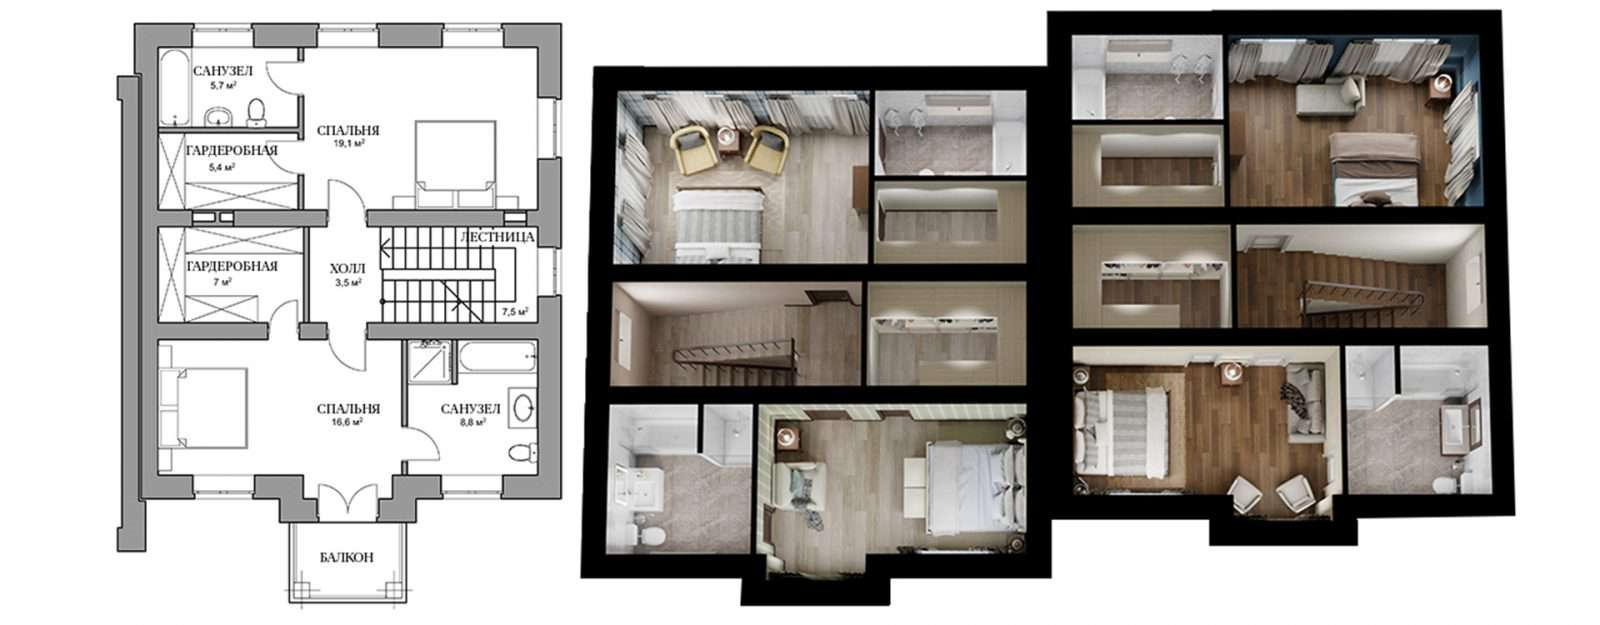 Дуплекс «Саманта» - план второго этажа